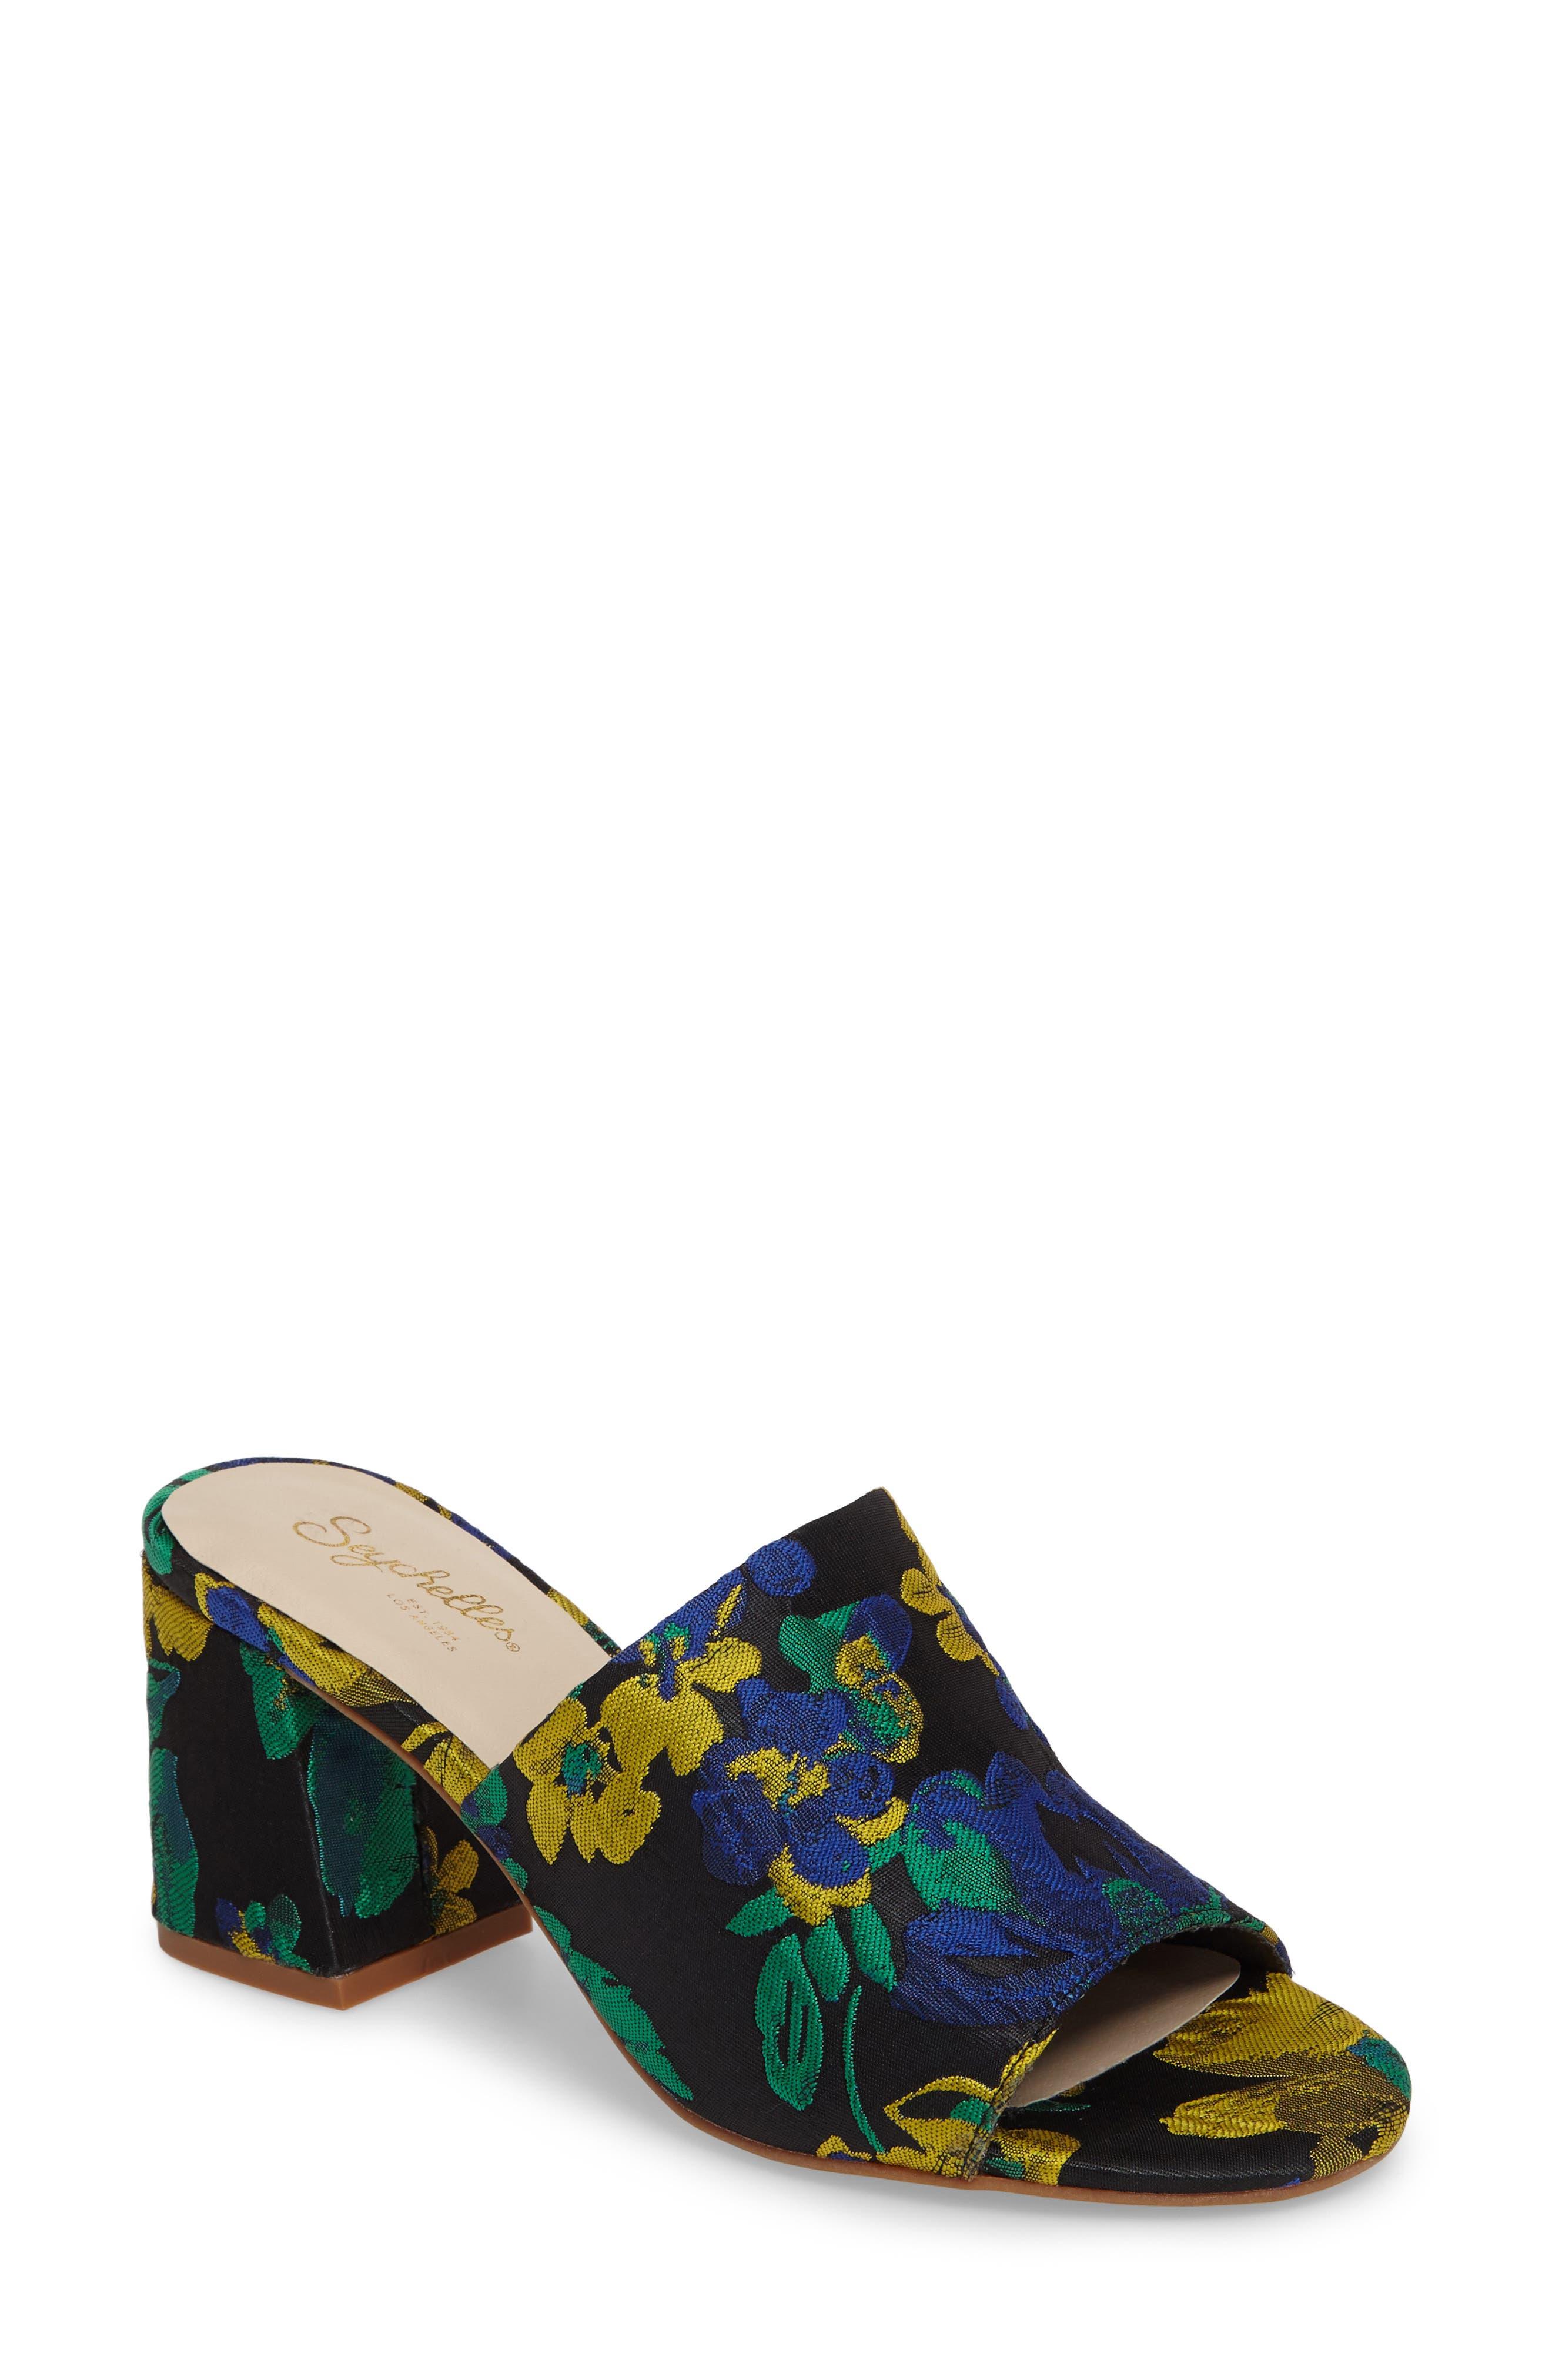 Alternate Image 1 Selected - Seychelles Commute Floral Flared Heel Sandal (Women)